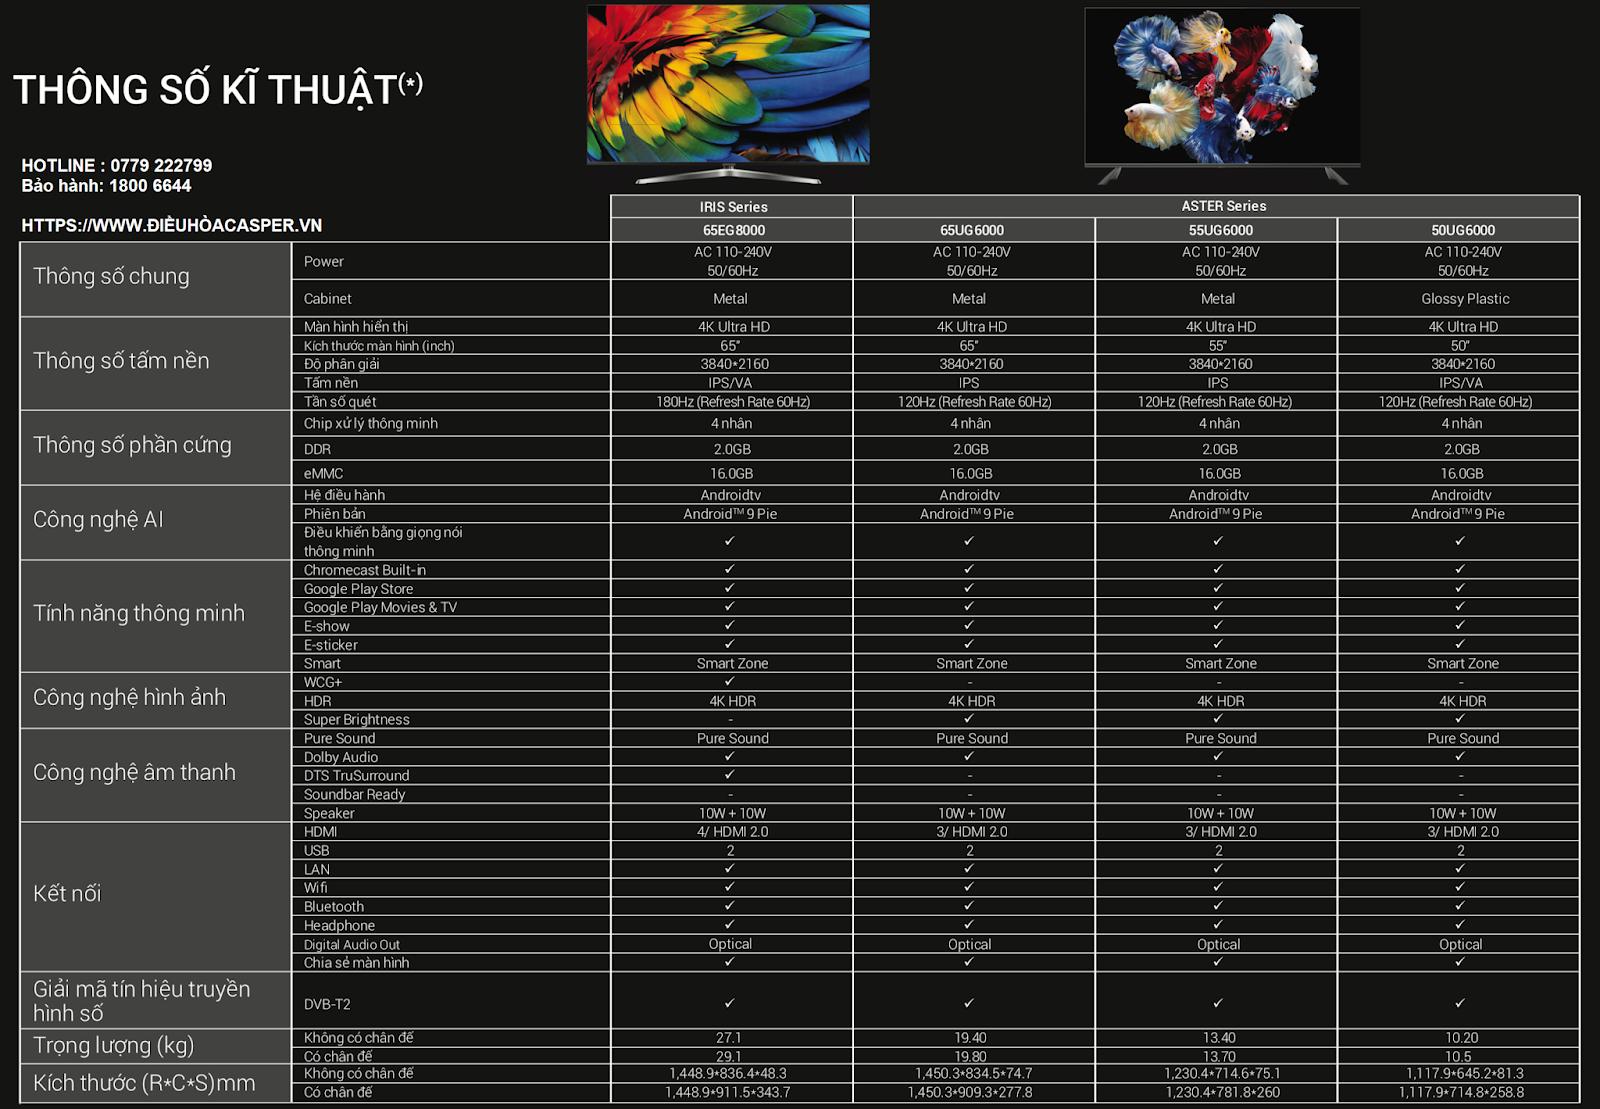 THÔNG SỐ KỸ THUẬT SMART TIVI CASPER 55UG6000